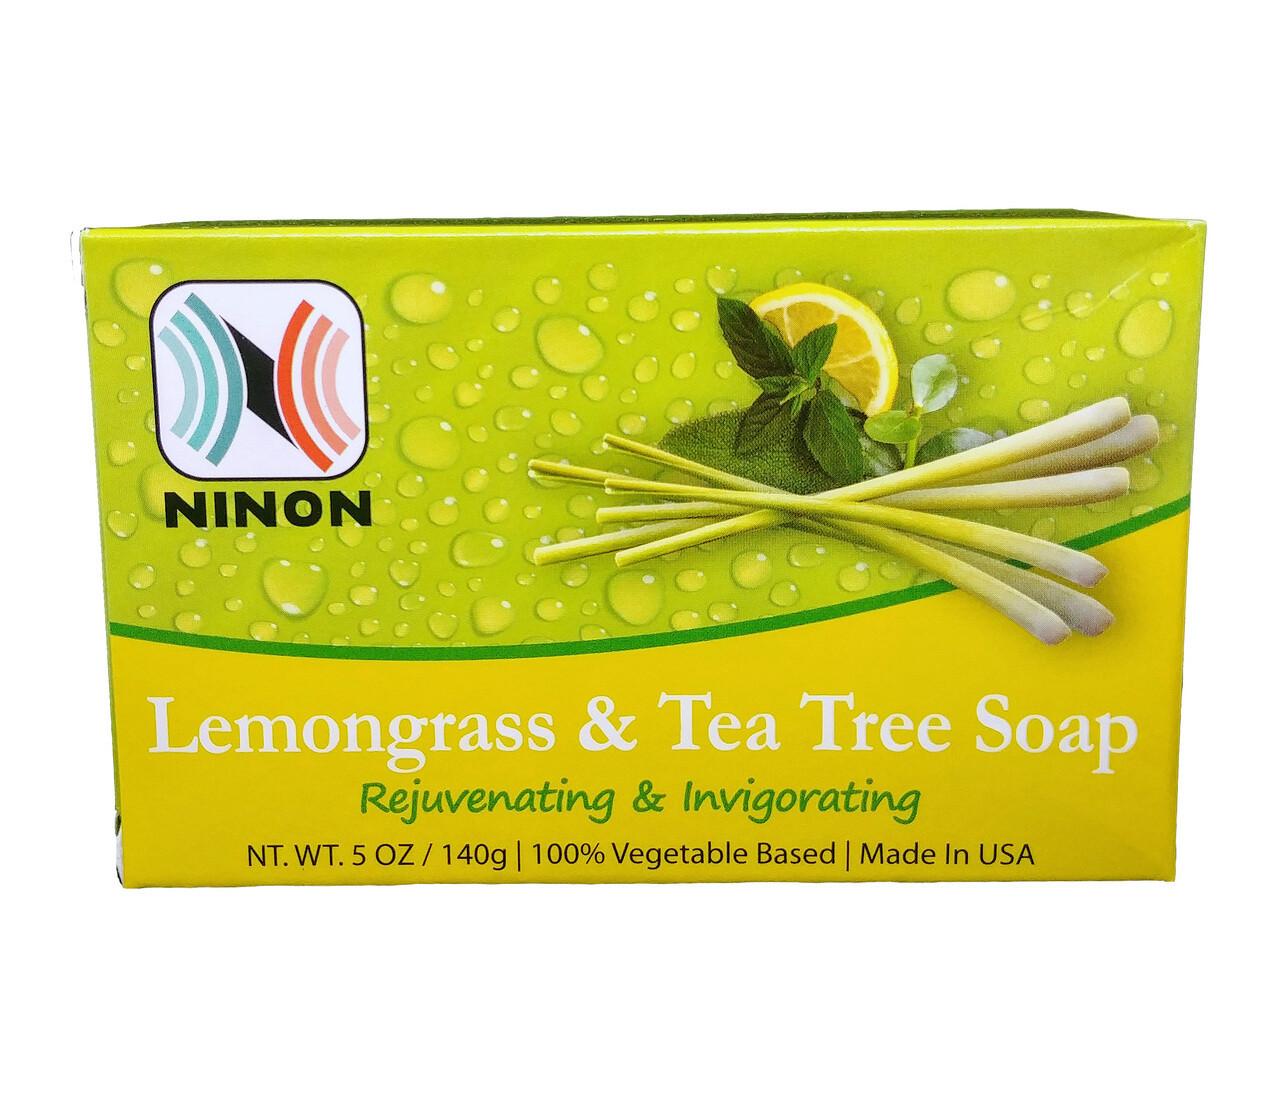 LEMONGRASS & TEA TREE SOAP